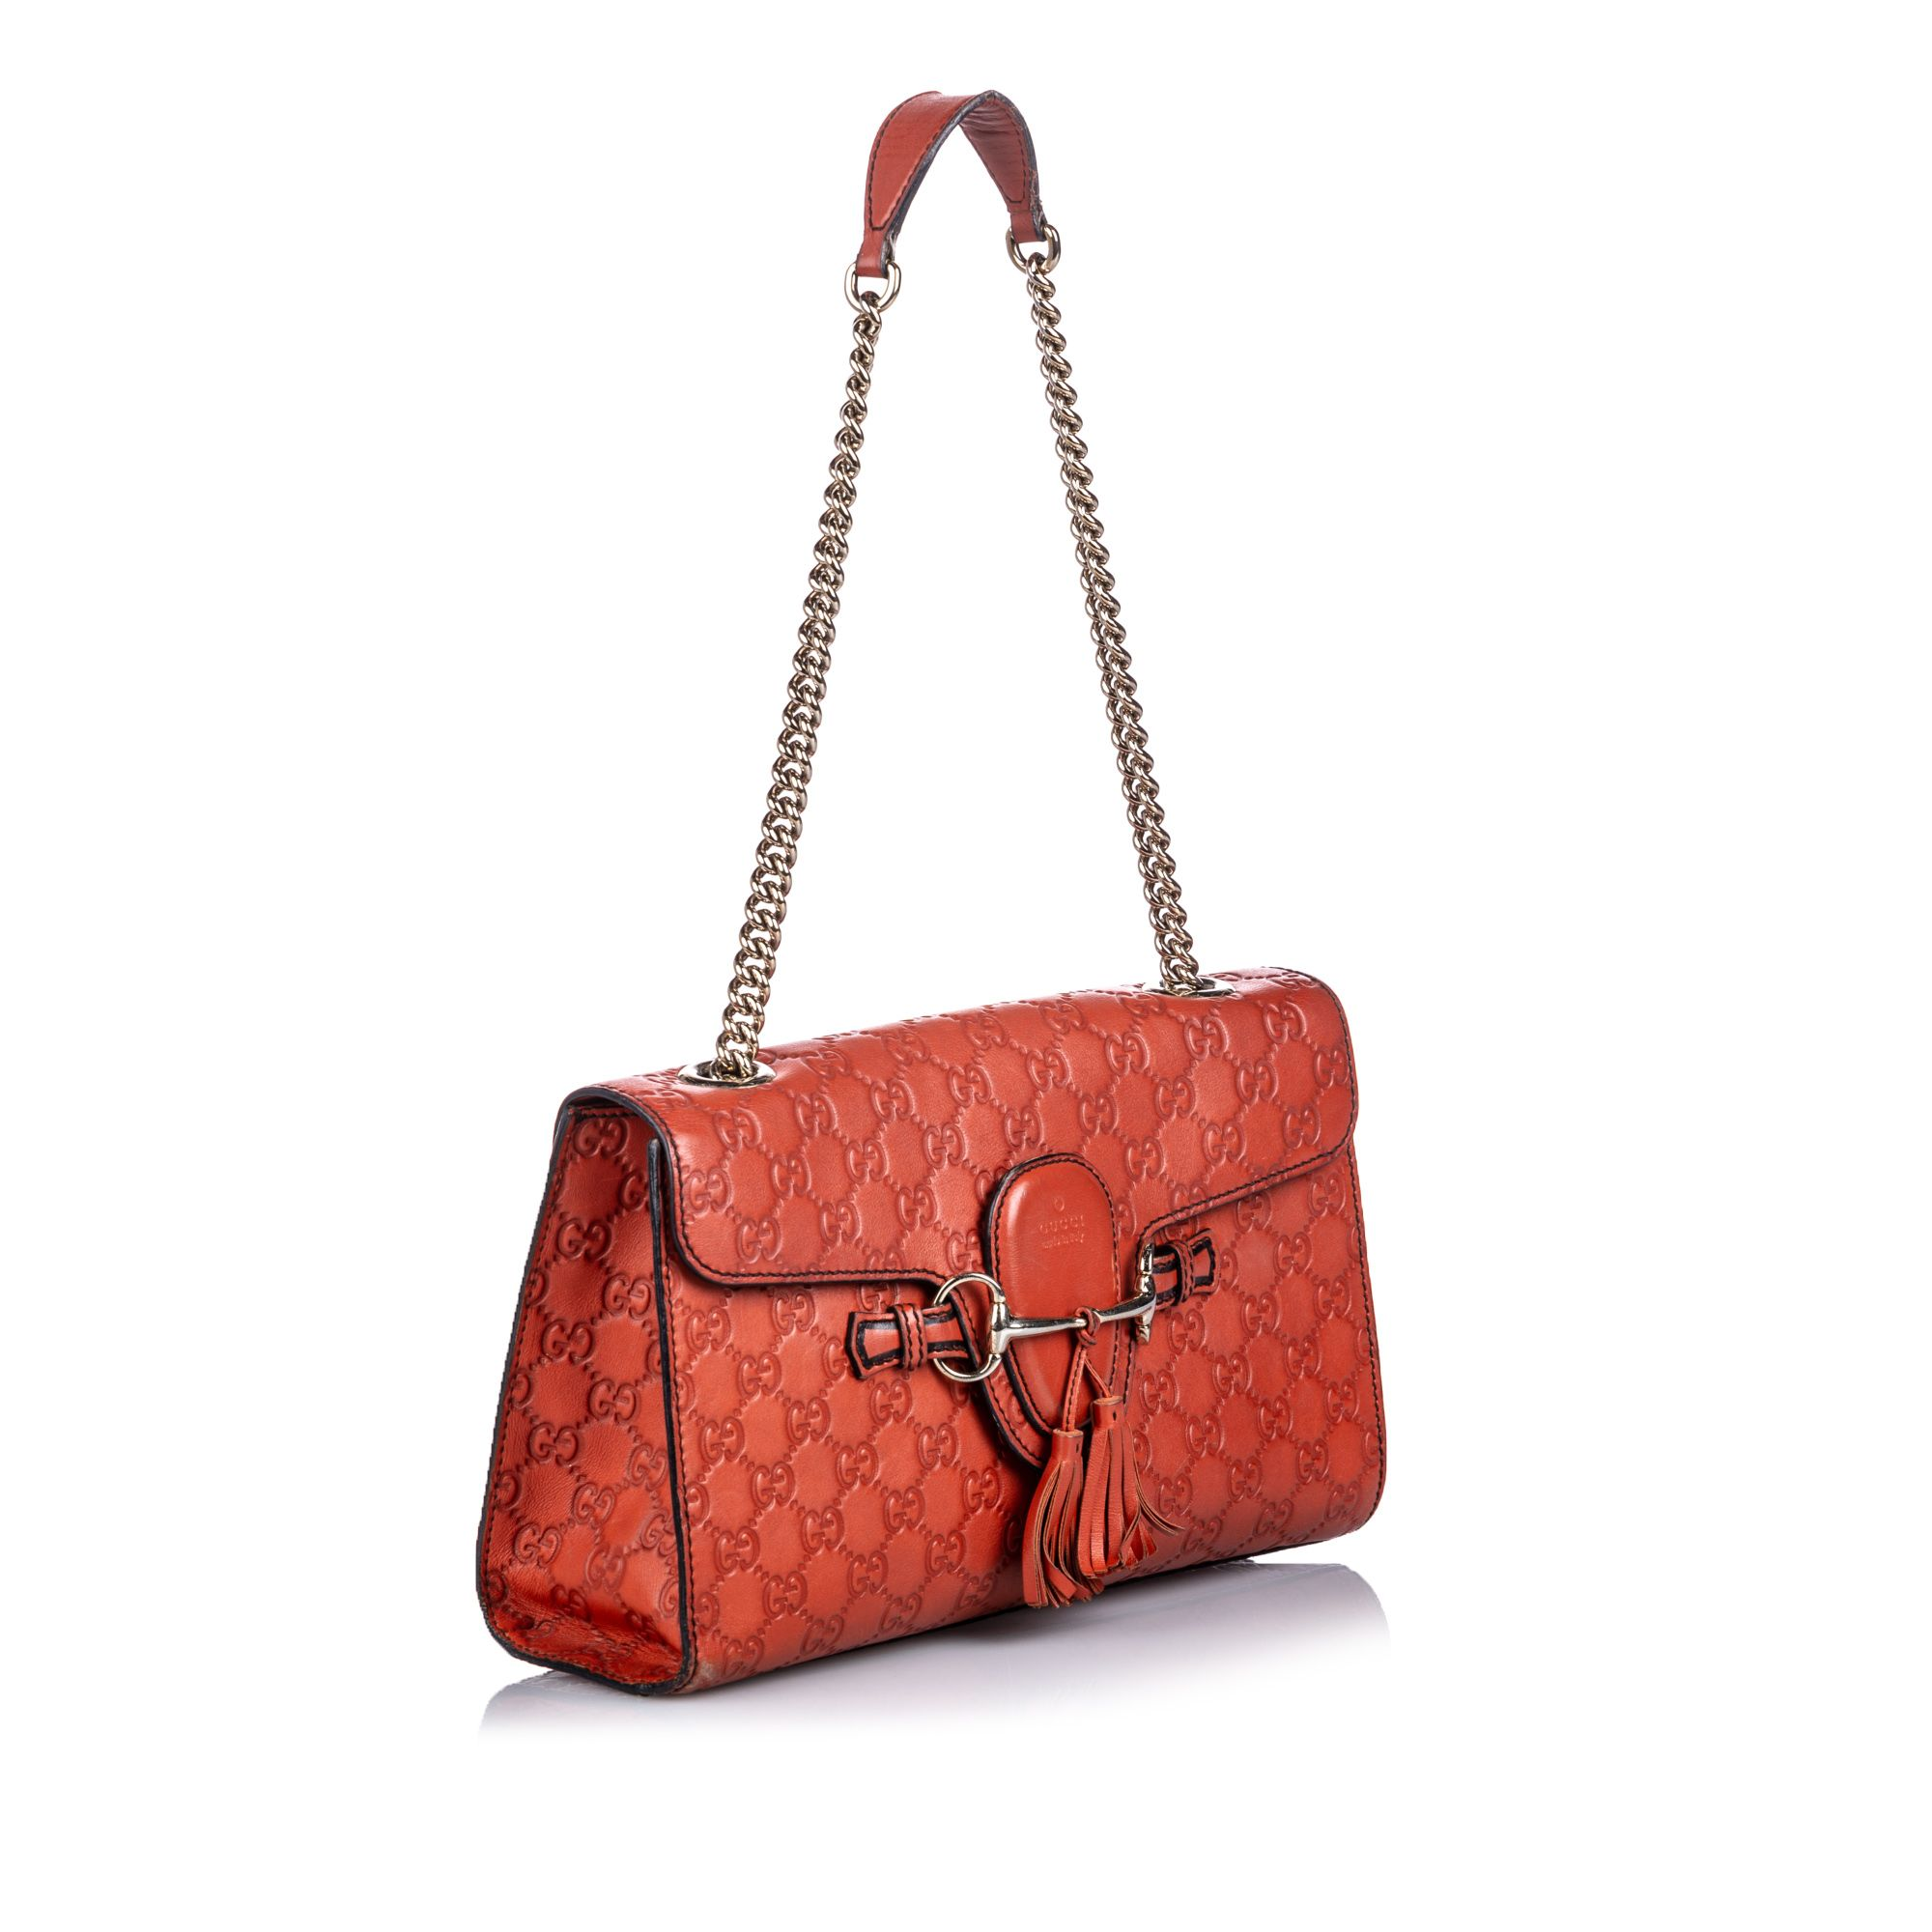 Vintage Gucci Guccissima Leather Emily Shoulder Bag Red